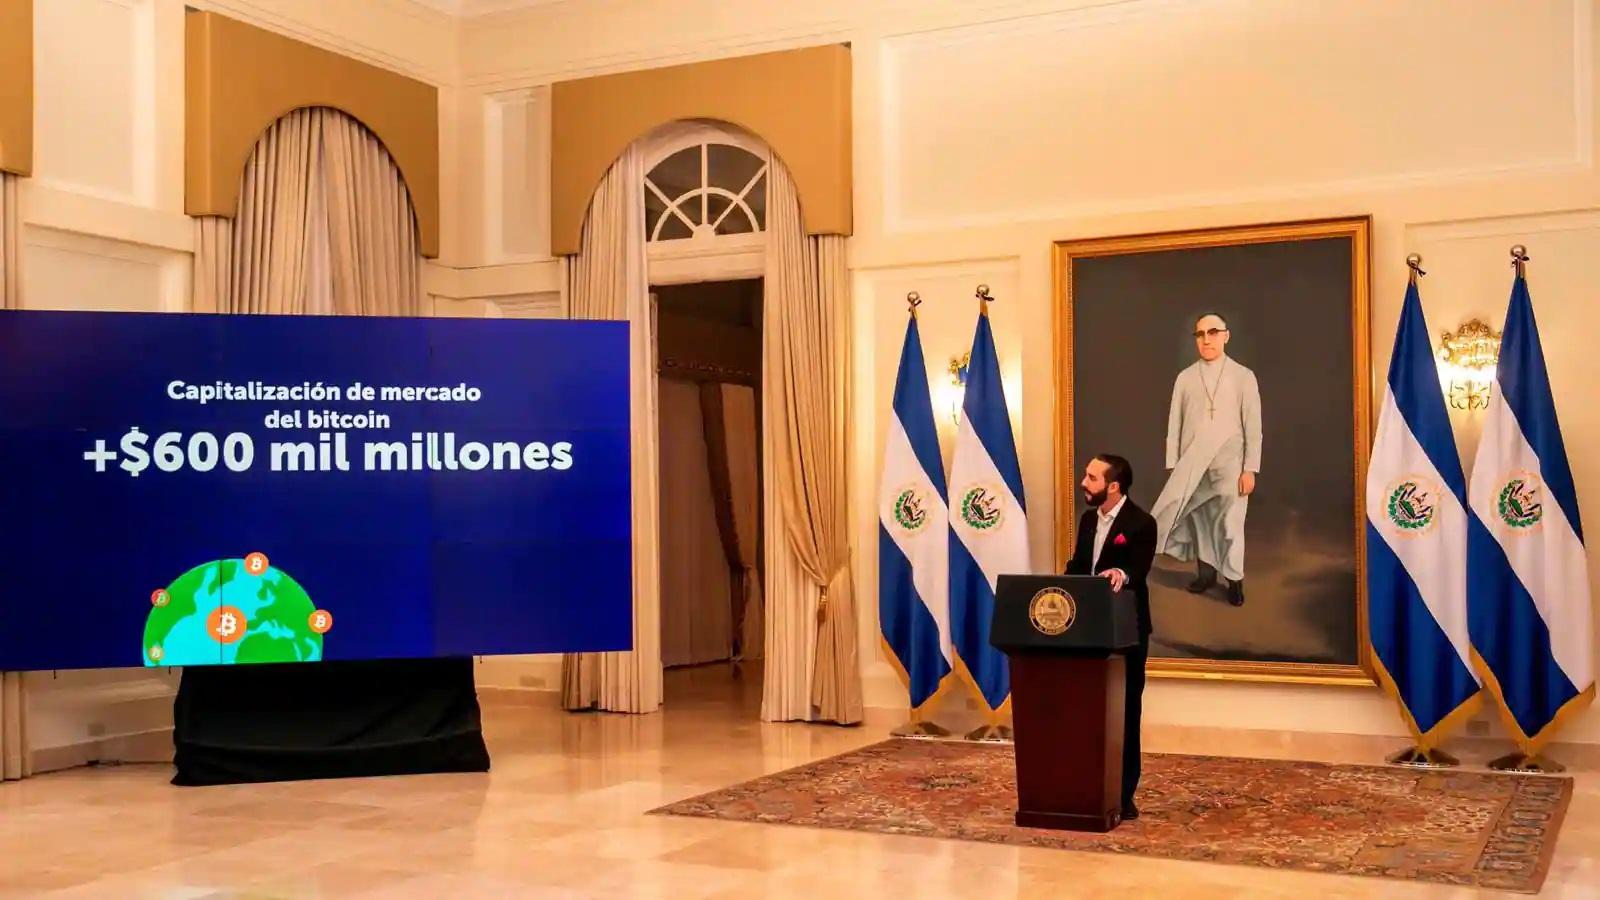 Pemerintah El Salvador, Amerika Tengah Menjanjikan Pemberian Bitcoin Kepada Penduduknya